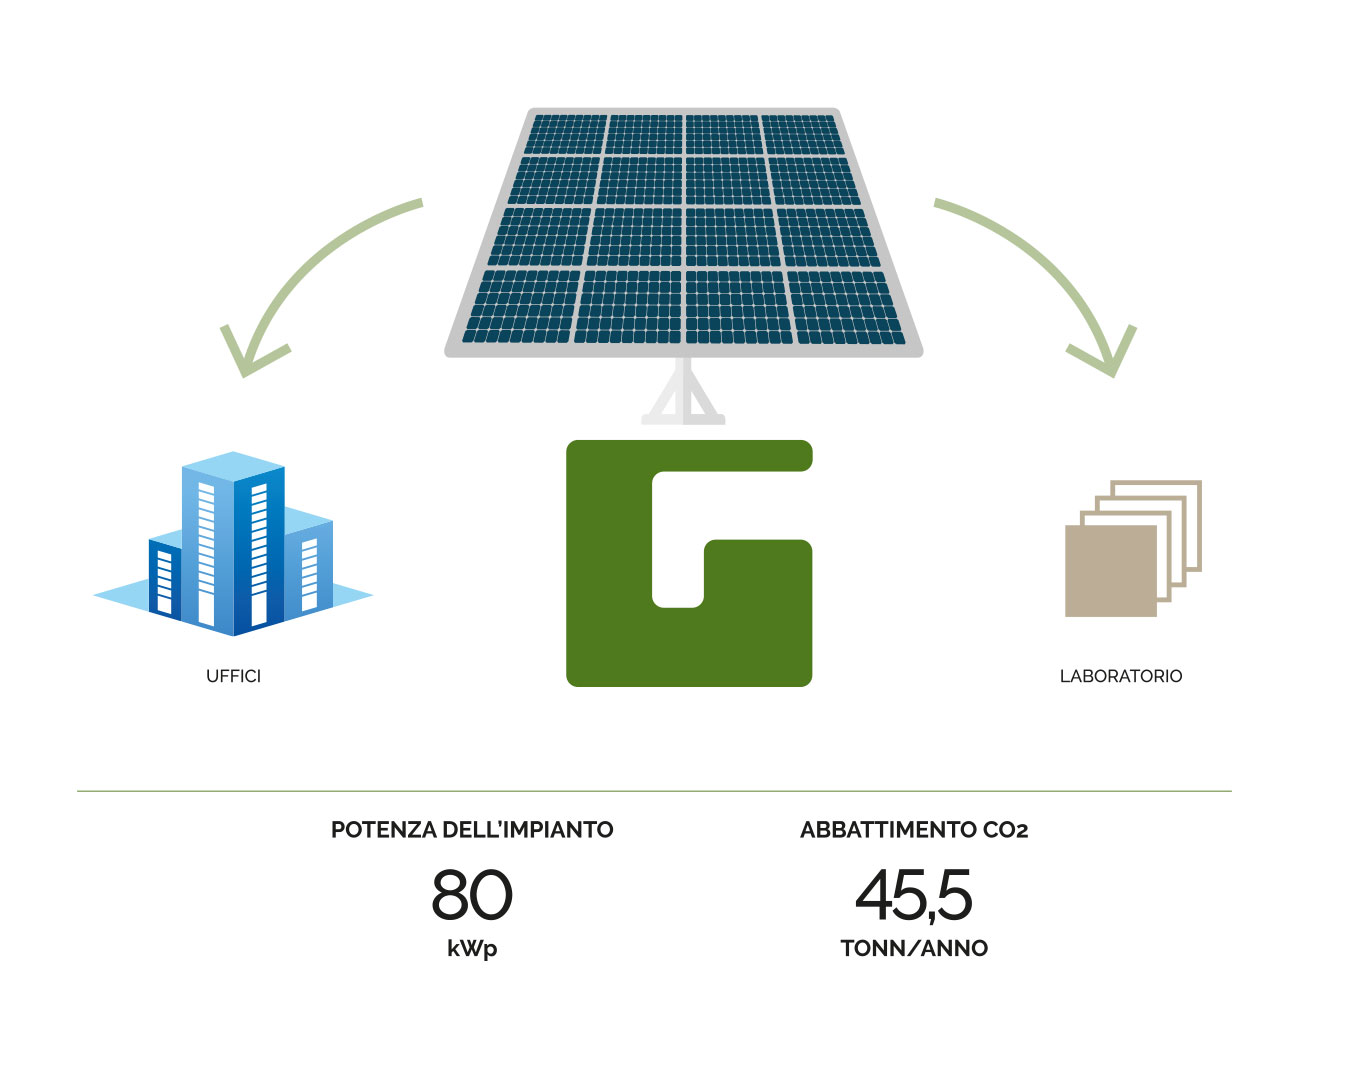 Ghirardi energie rinnovabili